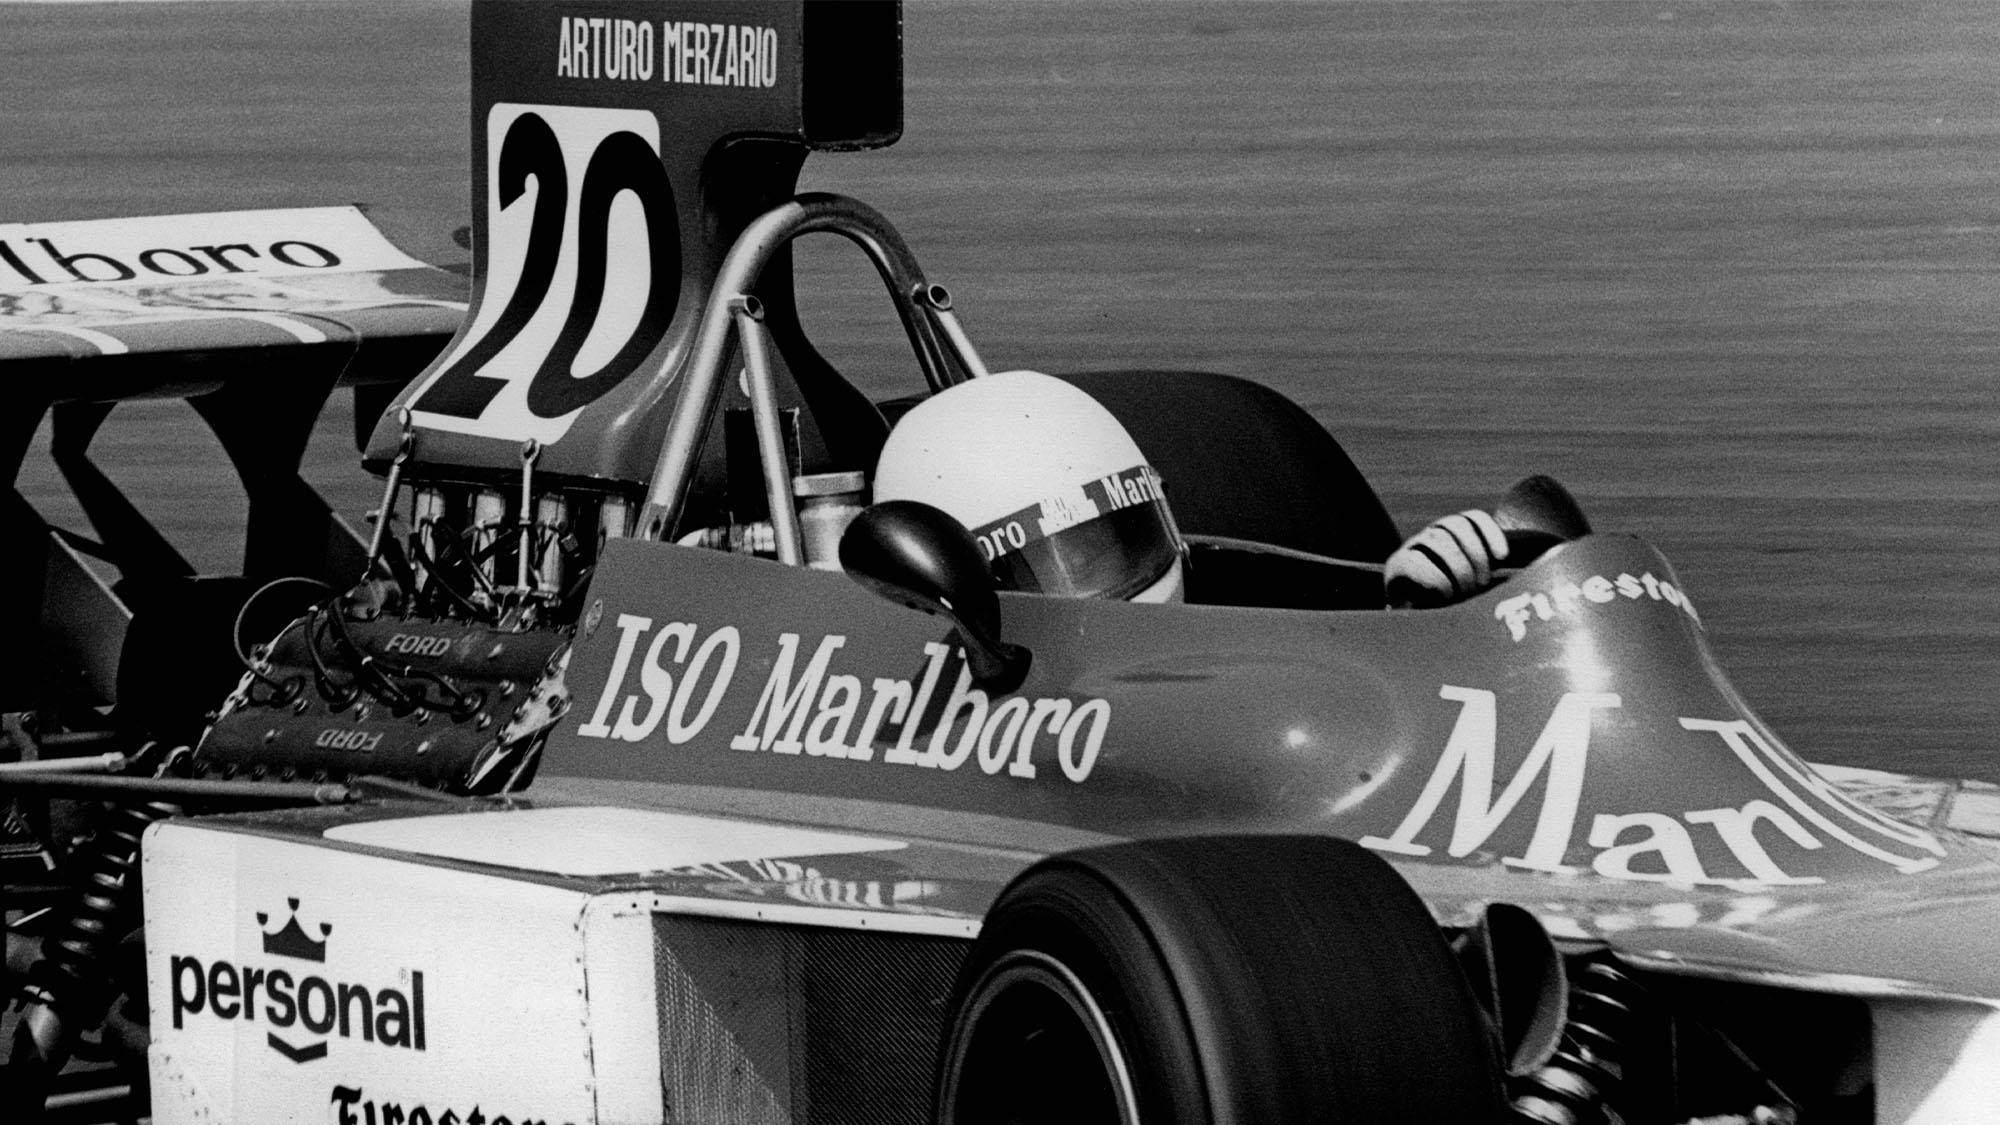 Arturo Merzario, Iso-Marlboro-Ford FW, Grand Prix of the Netherlands, Circuit Park Zandvoort, 23 June 1974. (Photo by Bernard Cahier/Getty Images)